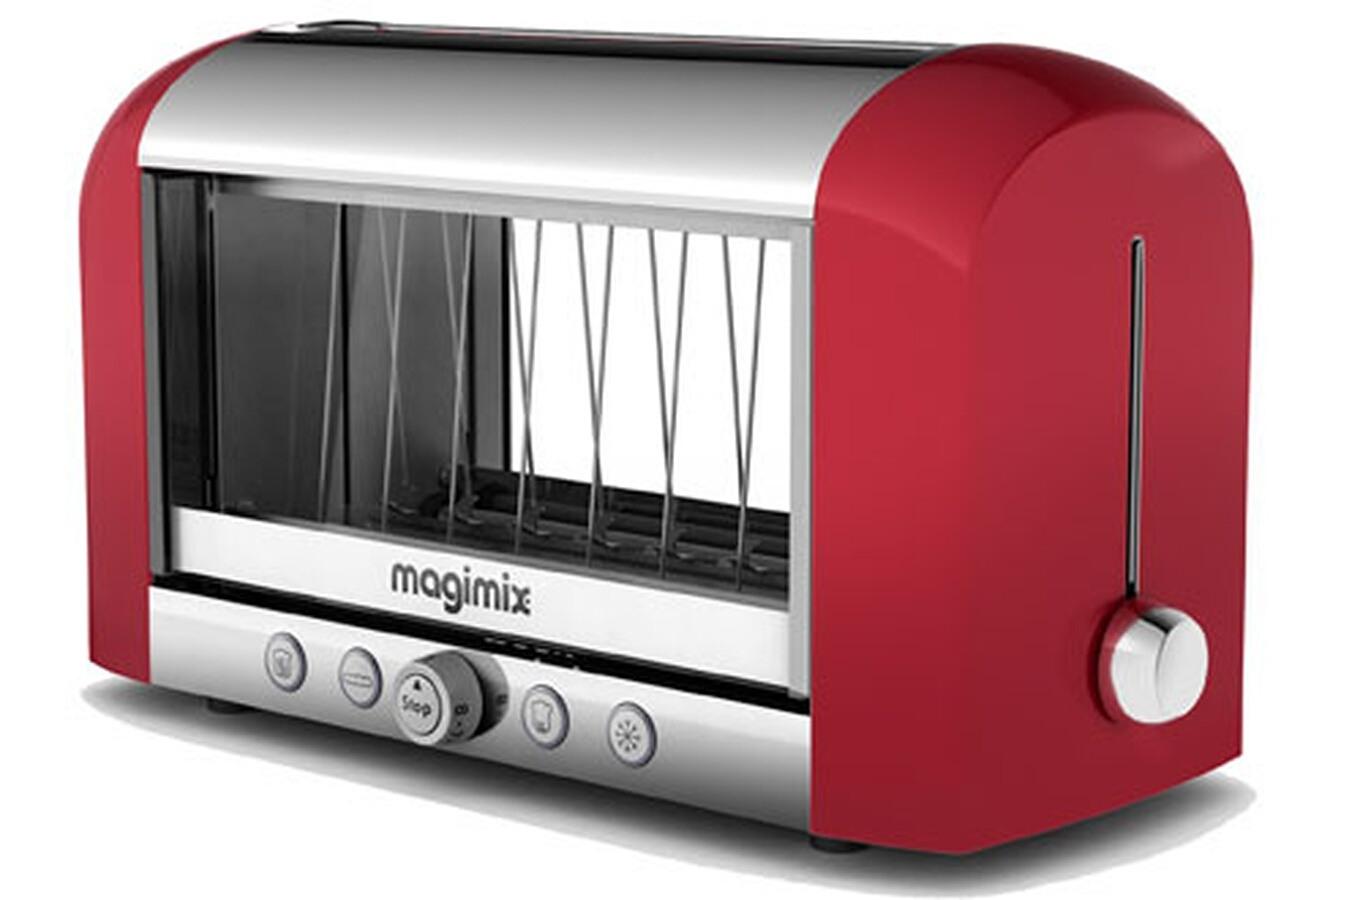 grille pain magimix 11528 vision rouge 3321525 darty. Black Bedroom Furniture Sets. Home Design Ideas